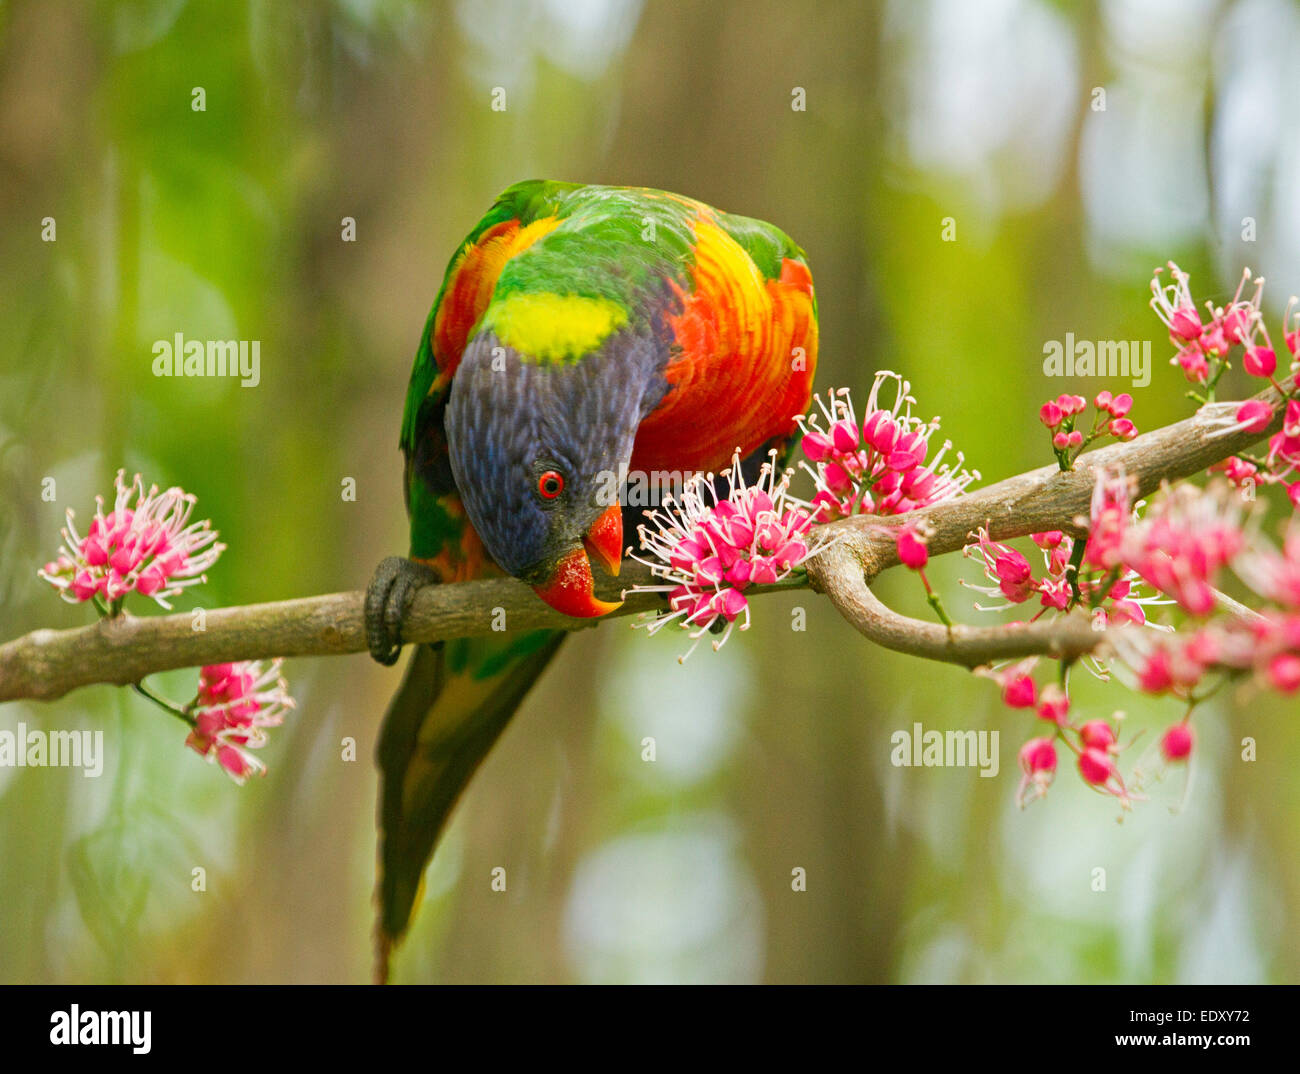 brightly coloured rainbow lorikeet australian parrot in the wild